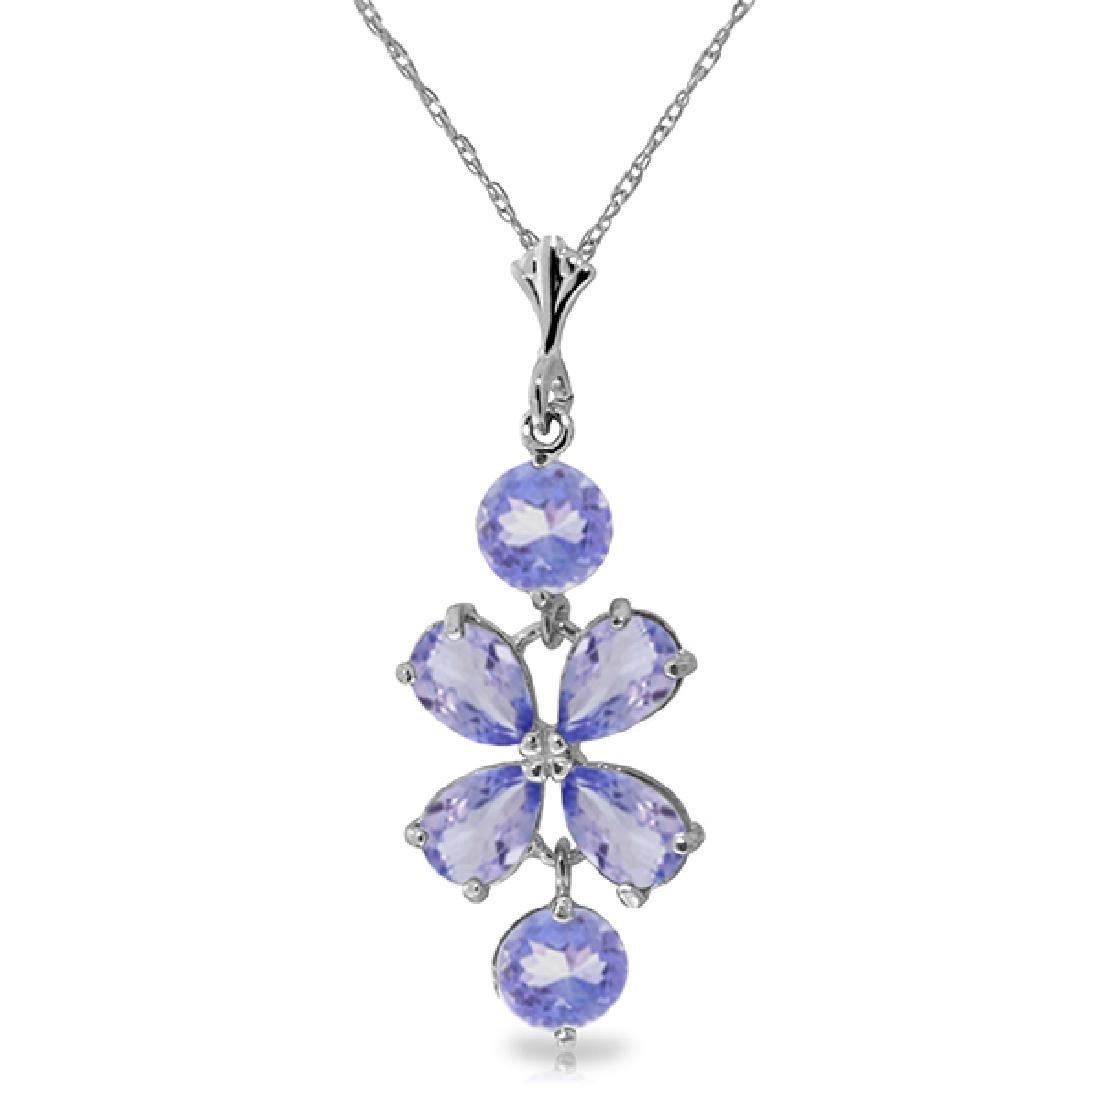 Genuine 3.15 ctw Tanzanite Necklace Jewelry 14KT White